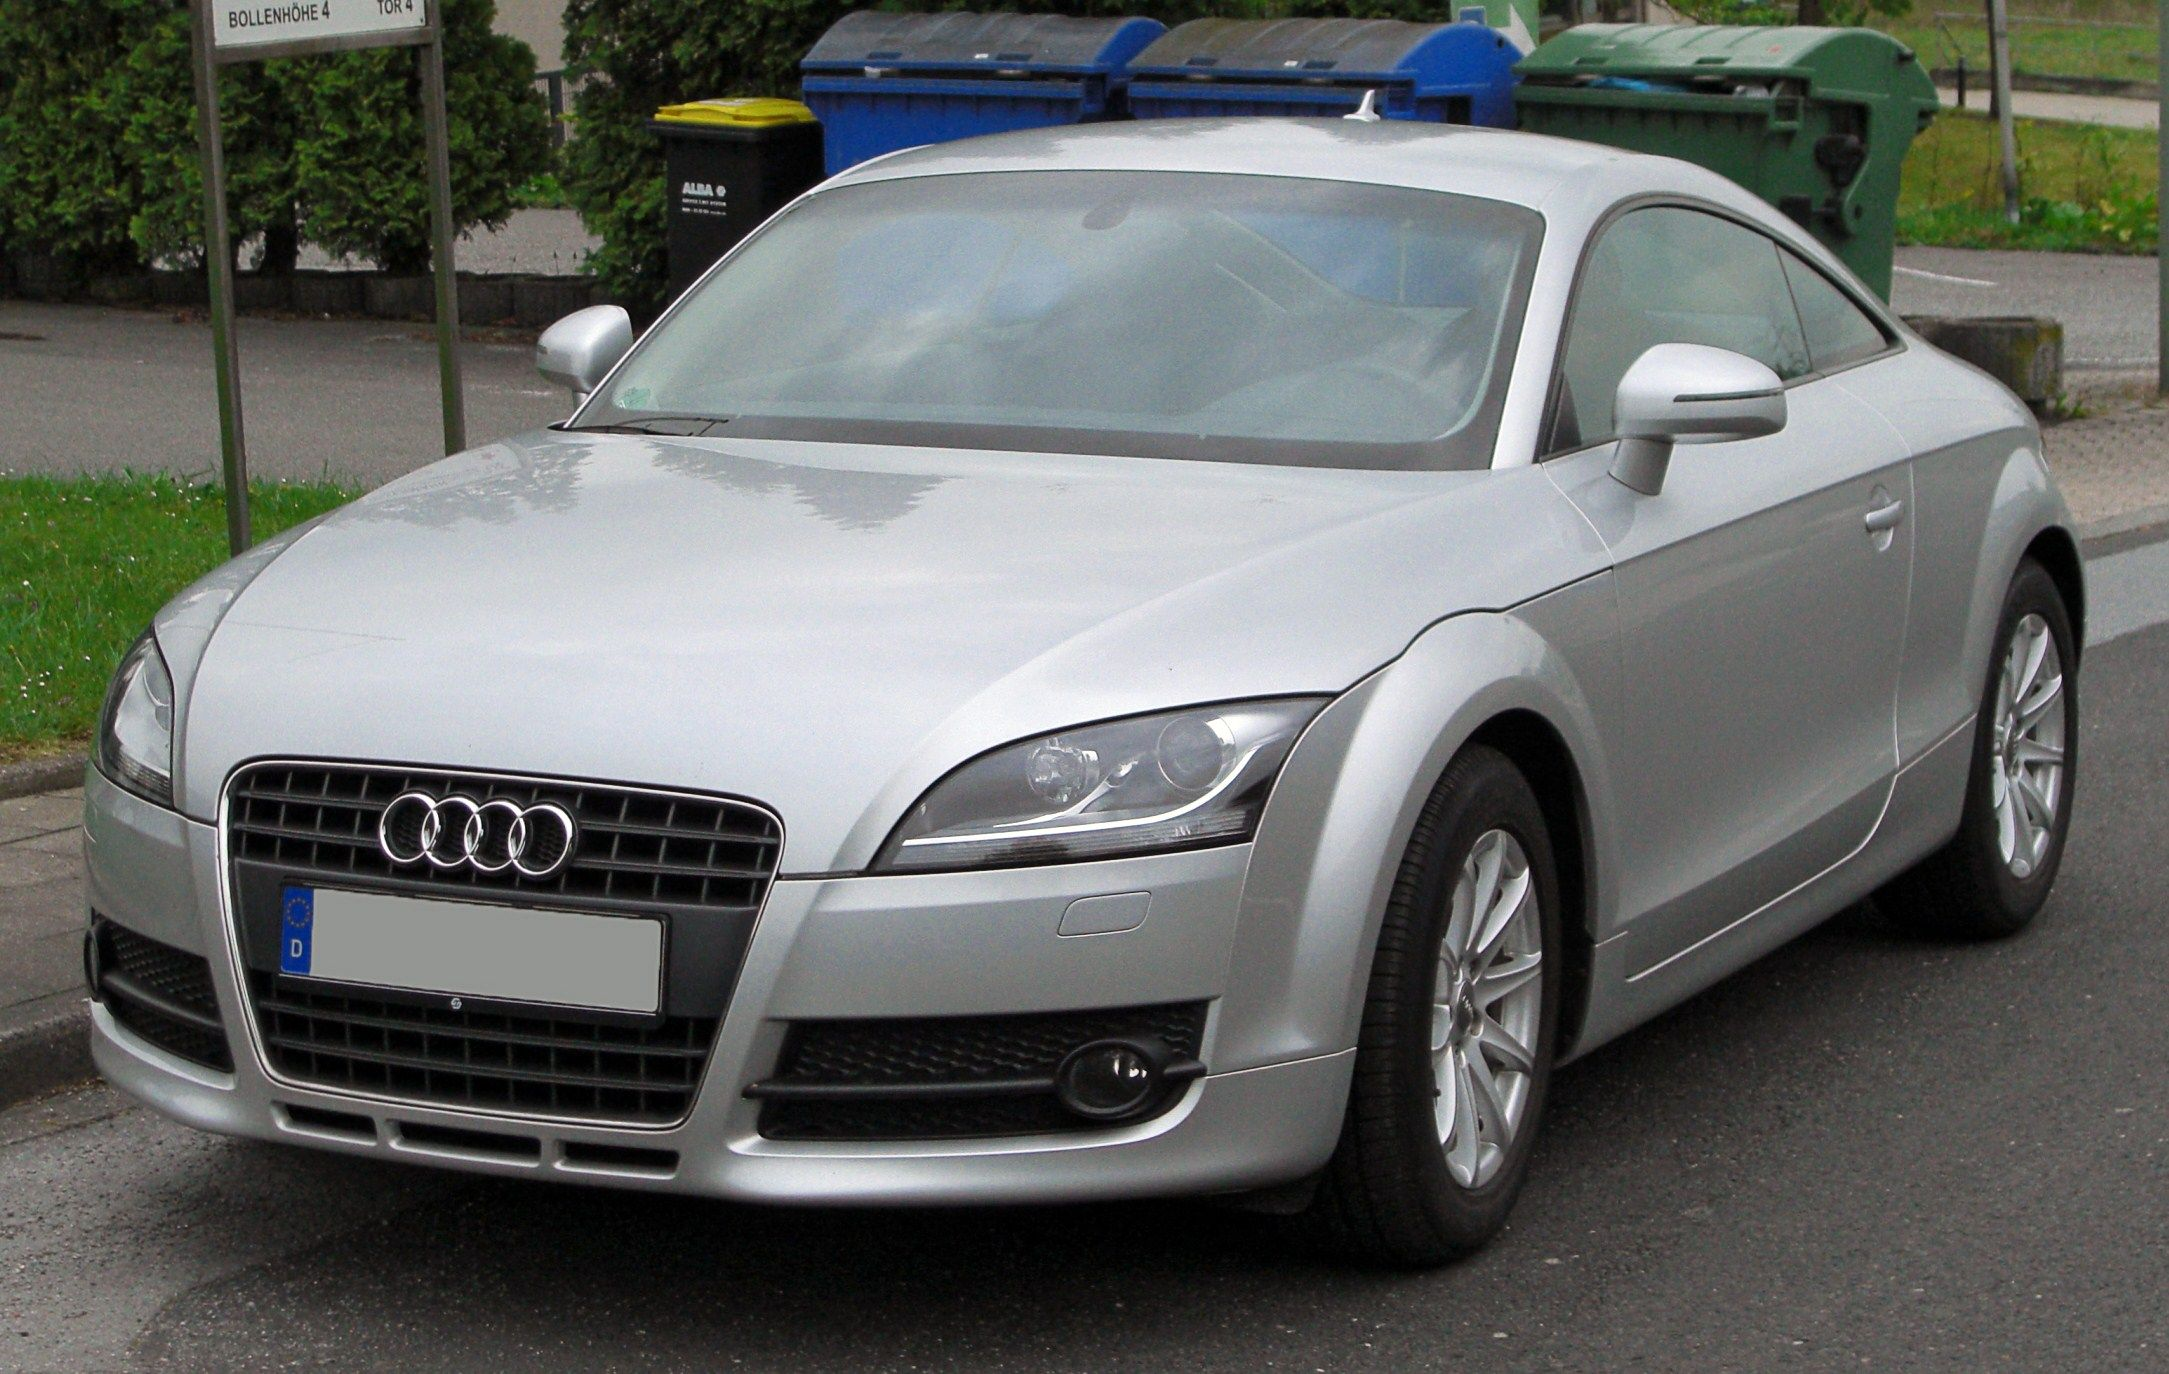 [Image: Audi_TT_Coup%C3%A9_II_front_20100503.jpg]